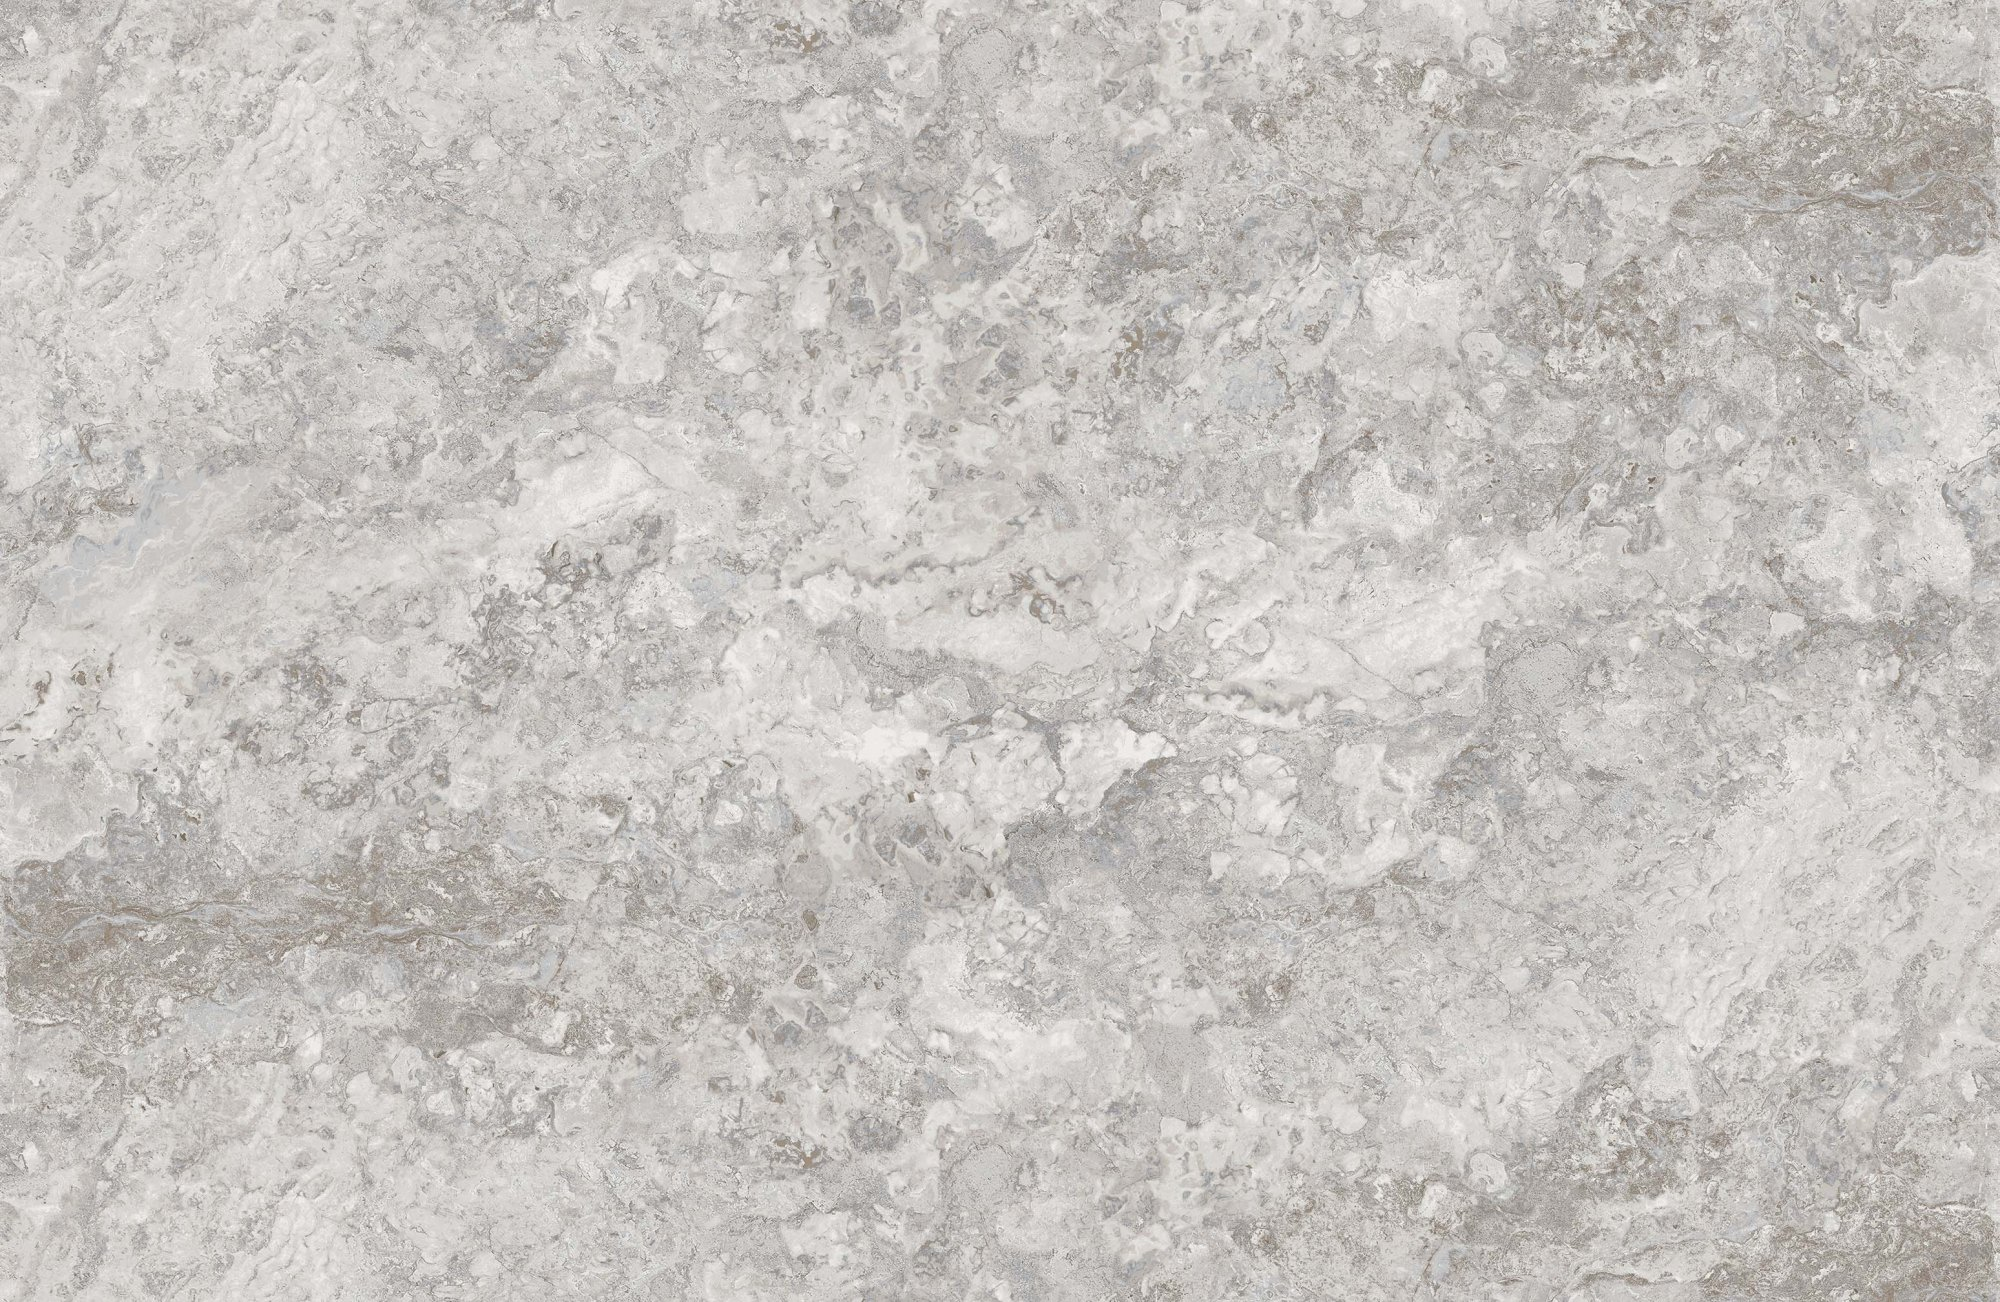 Northcott Stonehenge Gradations 39304-94 Medium grey & brown Graphite